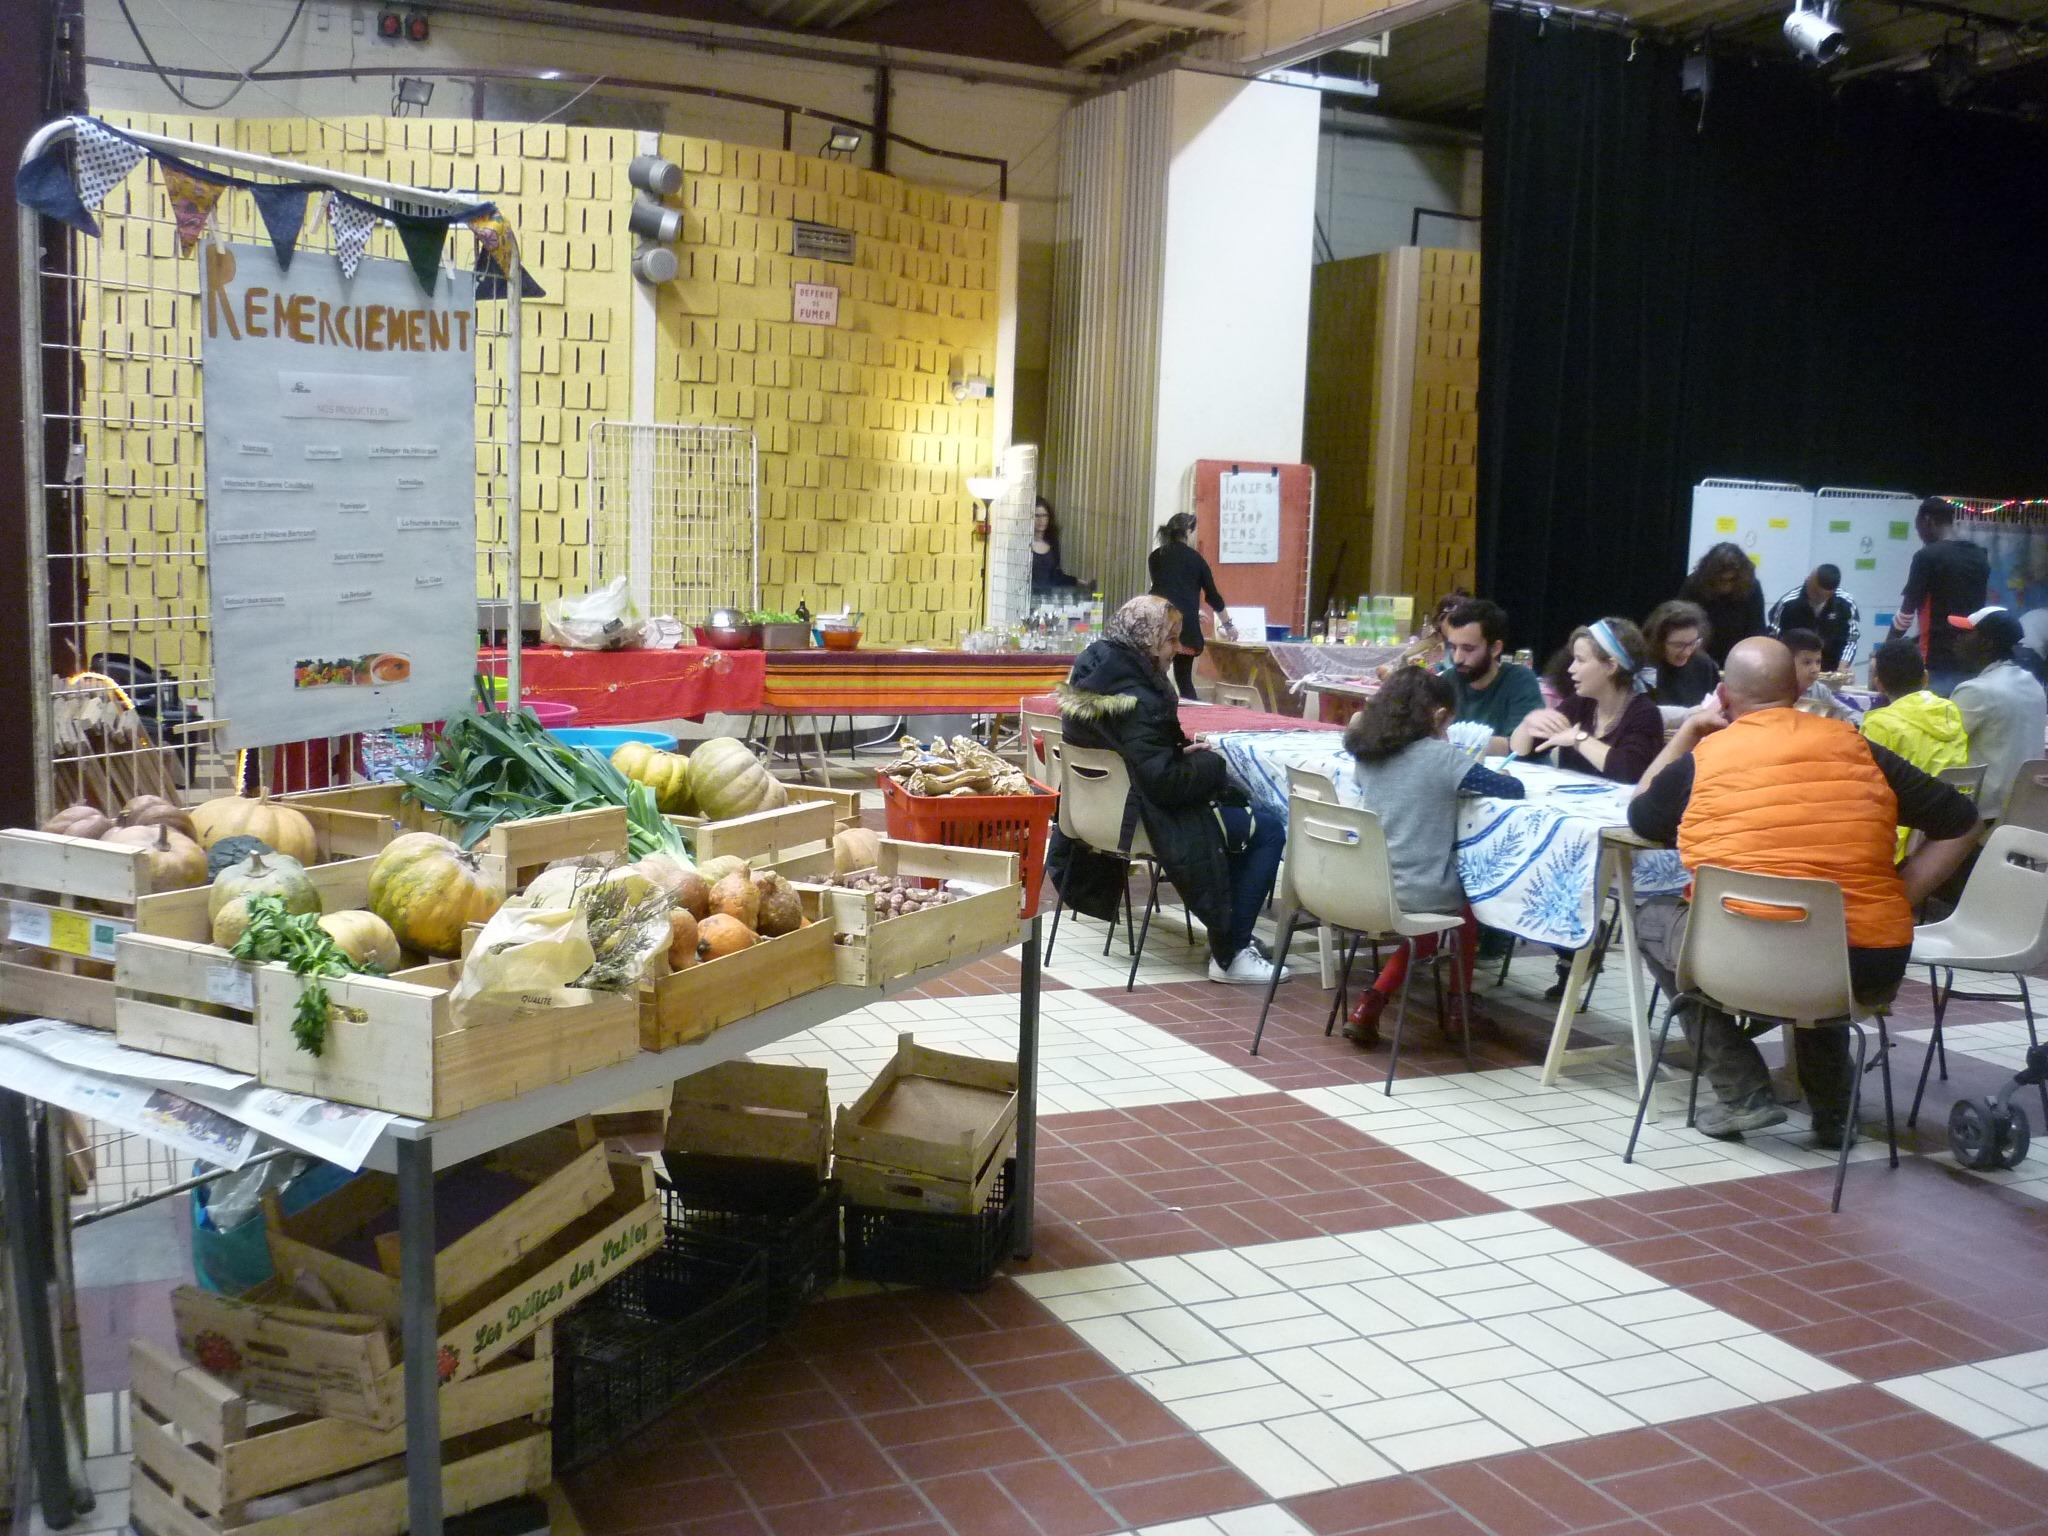 Market with veggetables at Festival des Solidarites, 2019